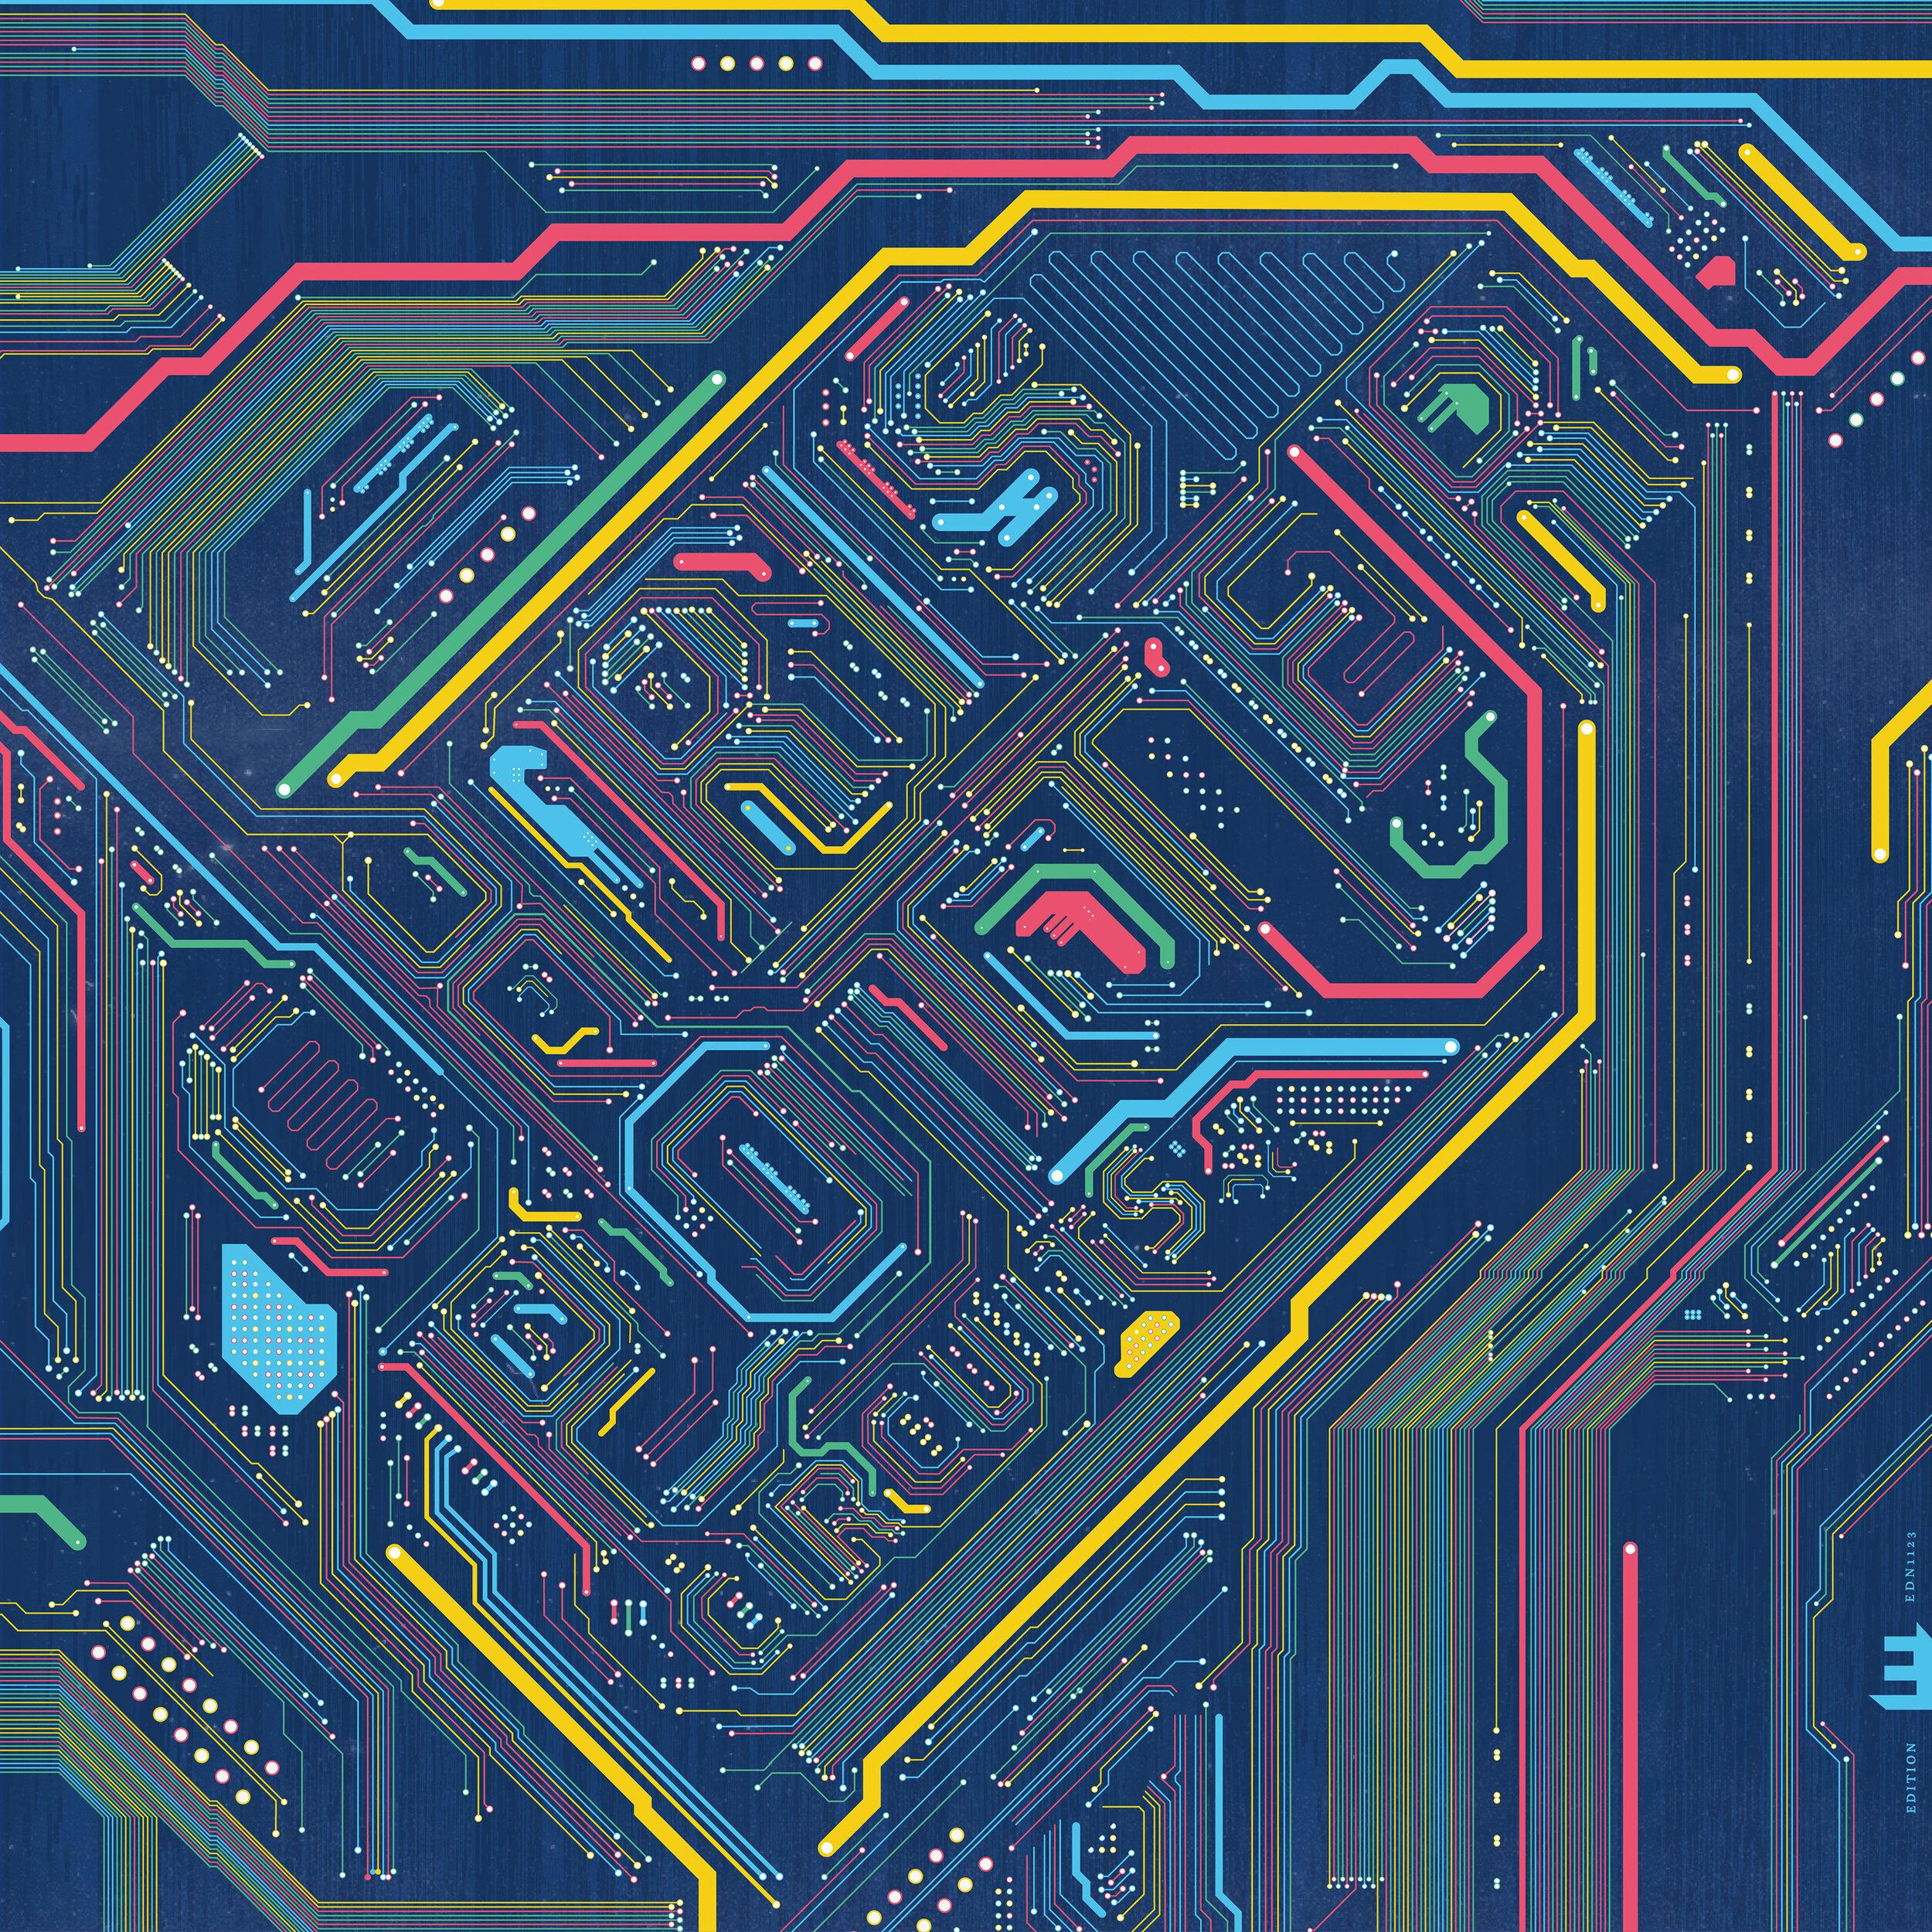 Circuits [Edition Records, 2019]